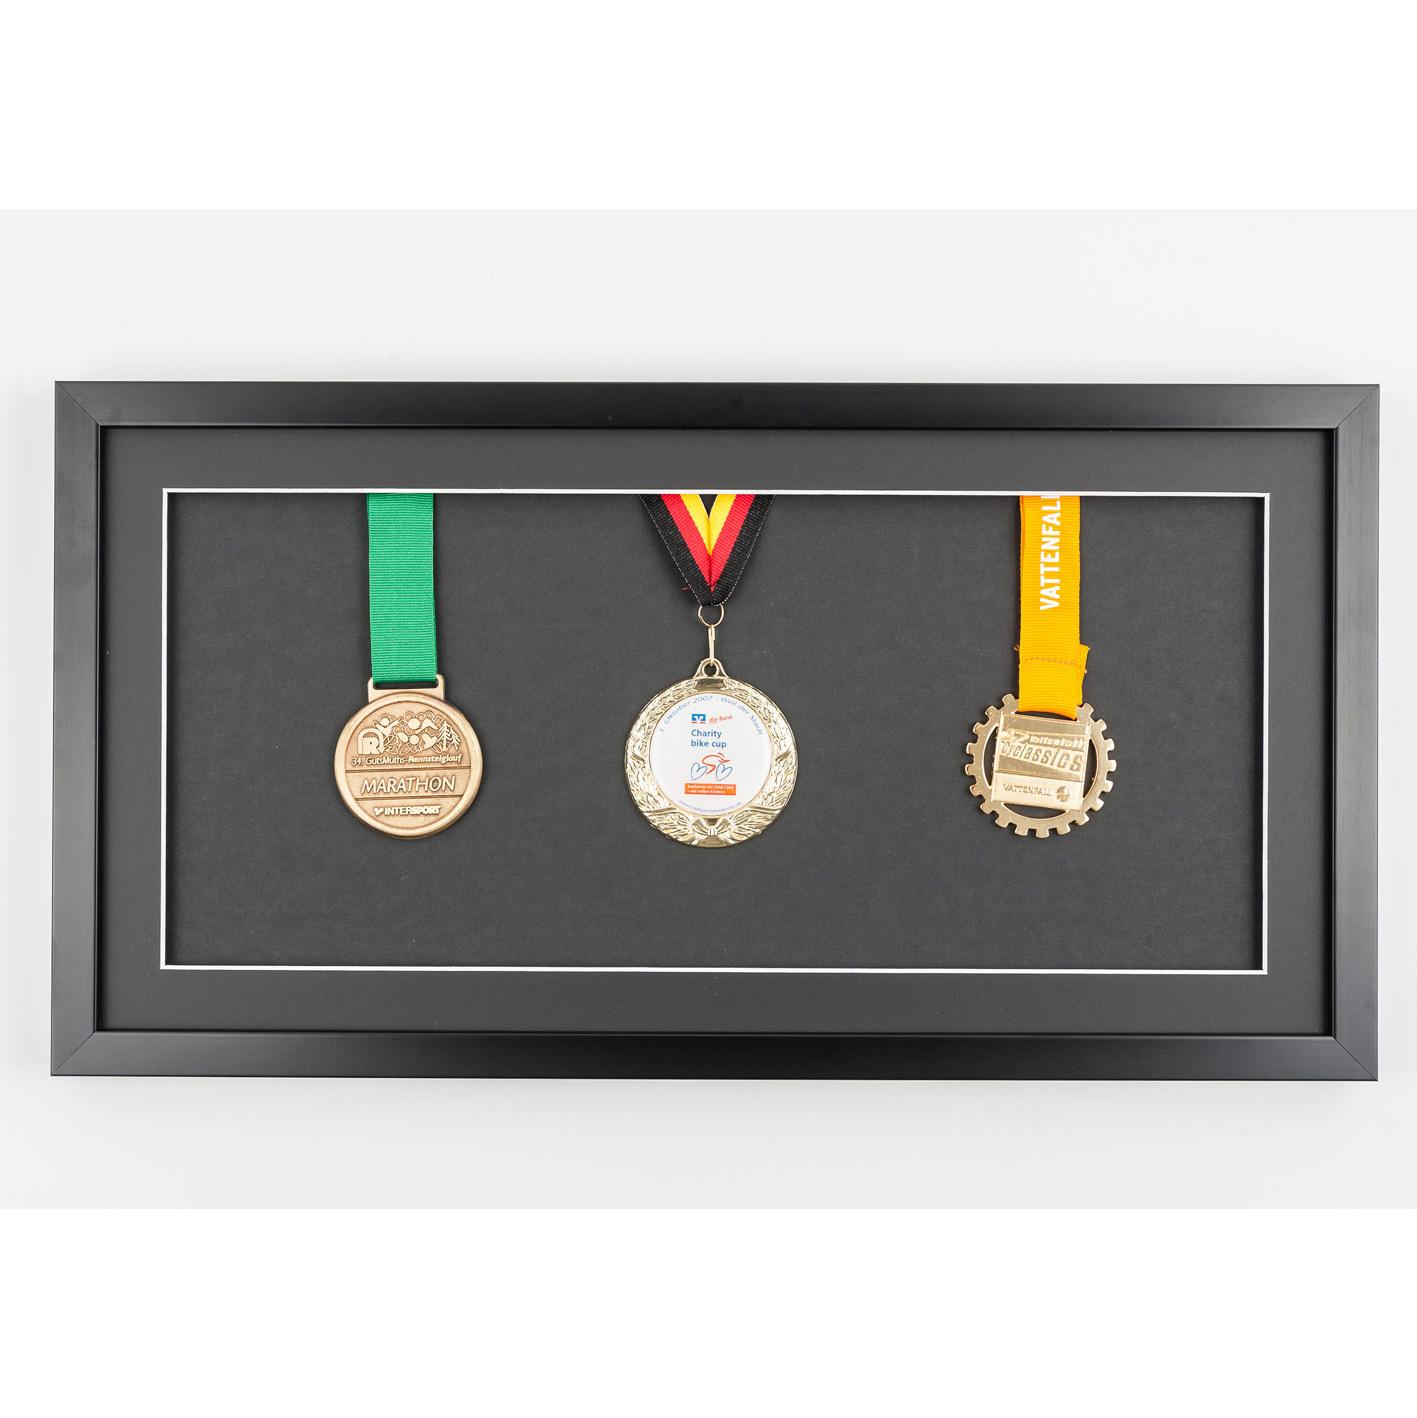 Medaljeramme 25x50 cm, sort